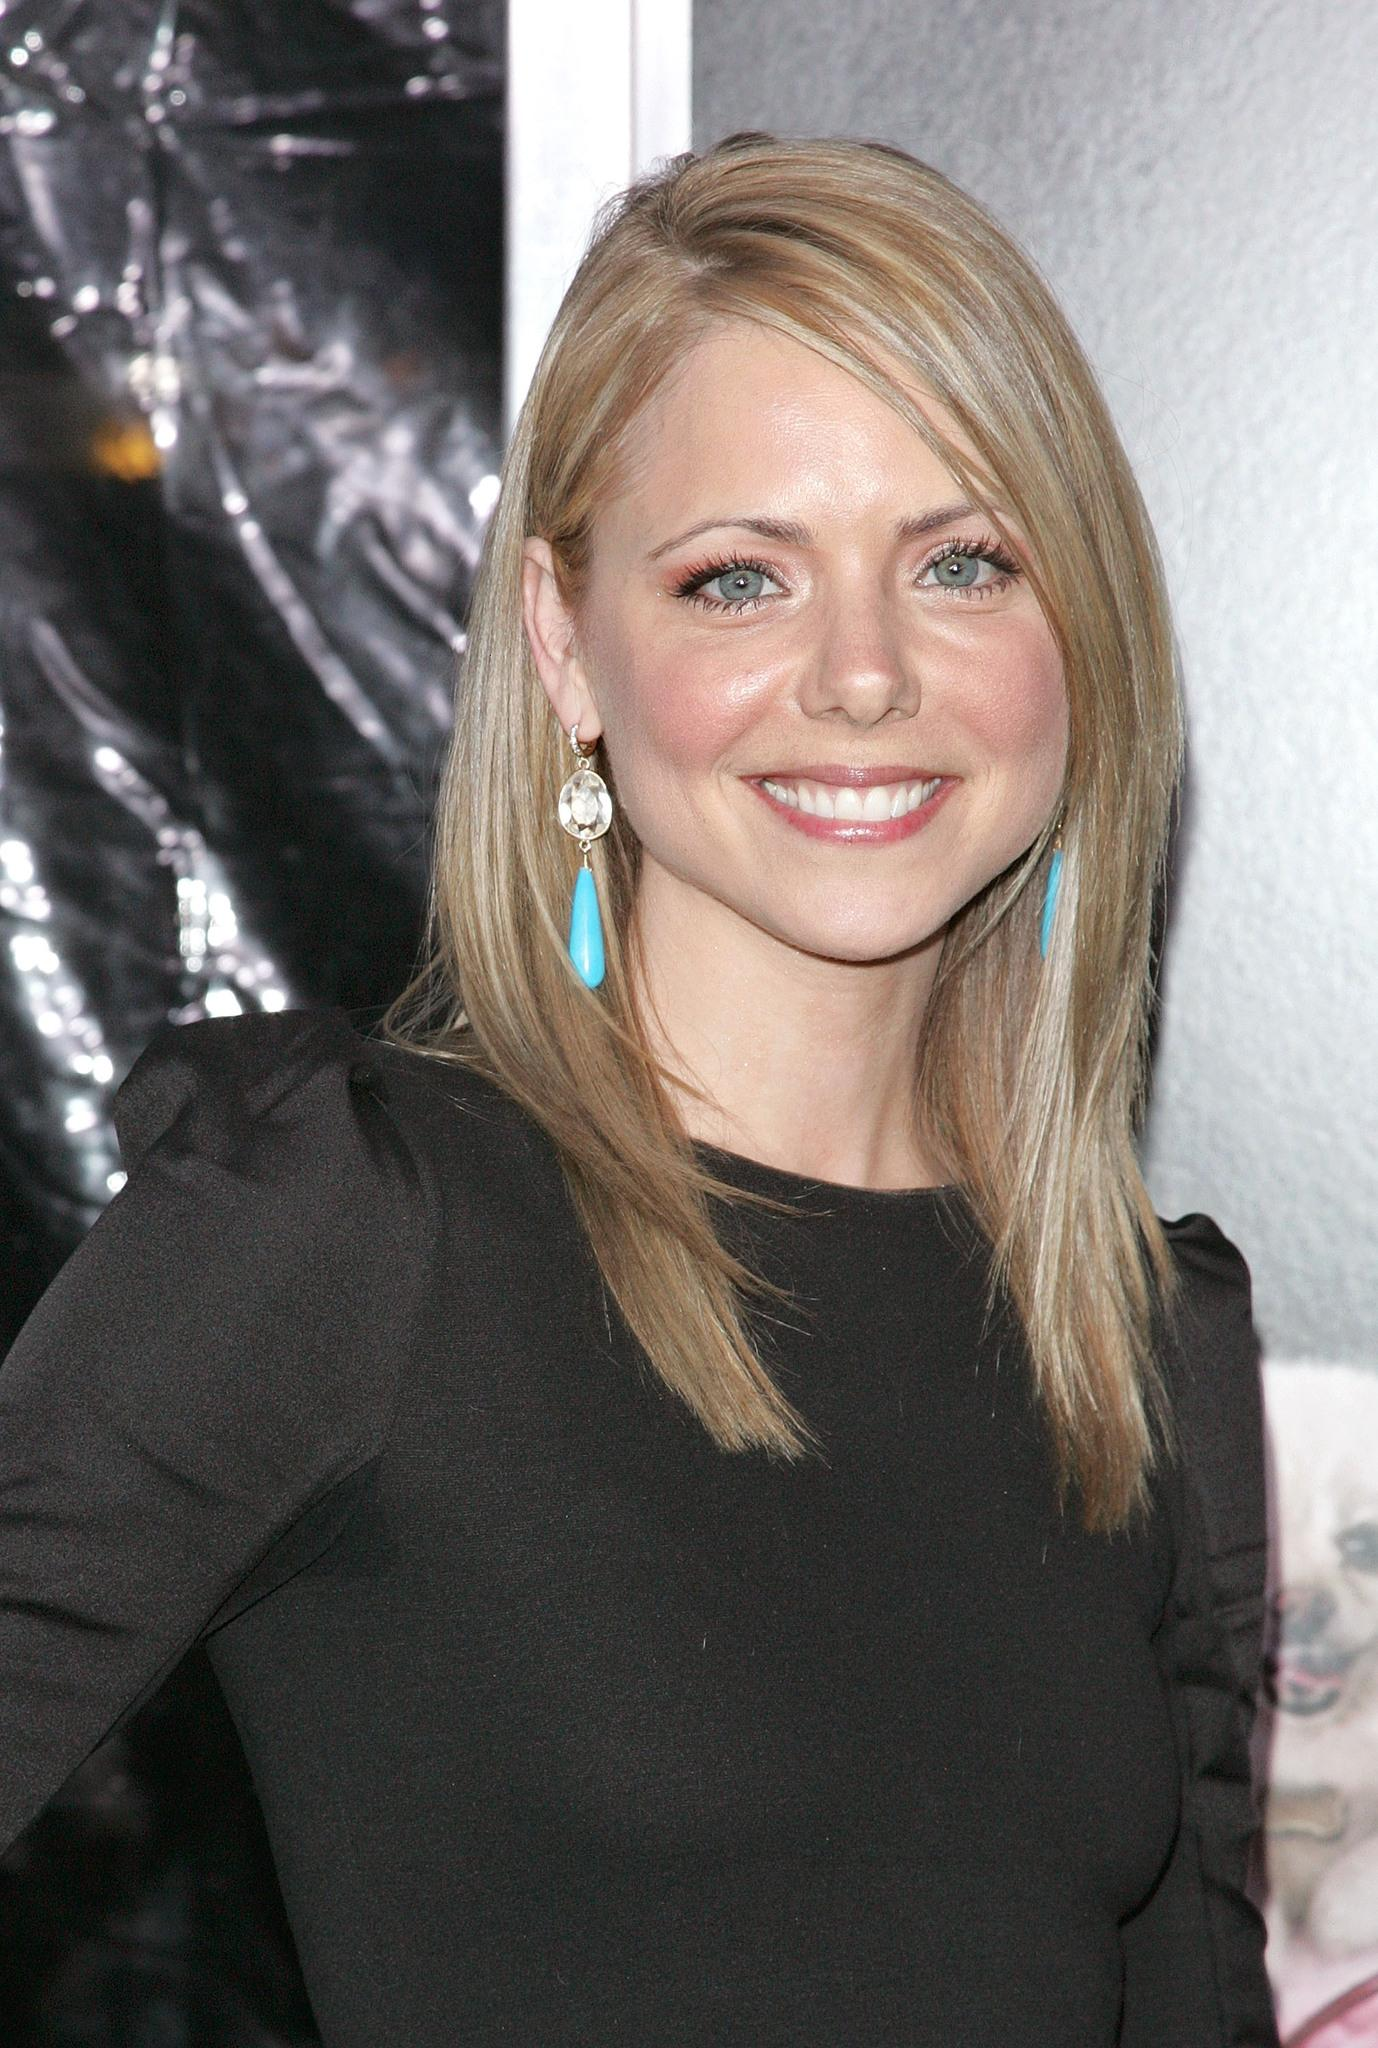 Collette Wolfe